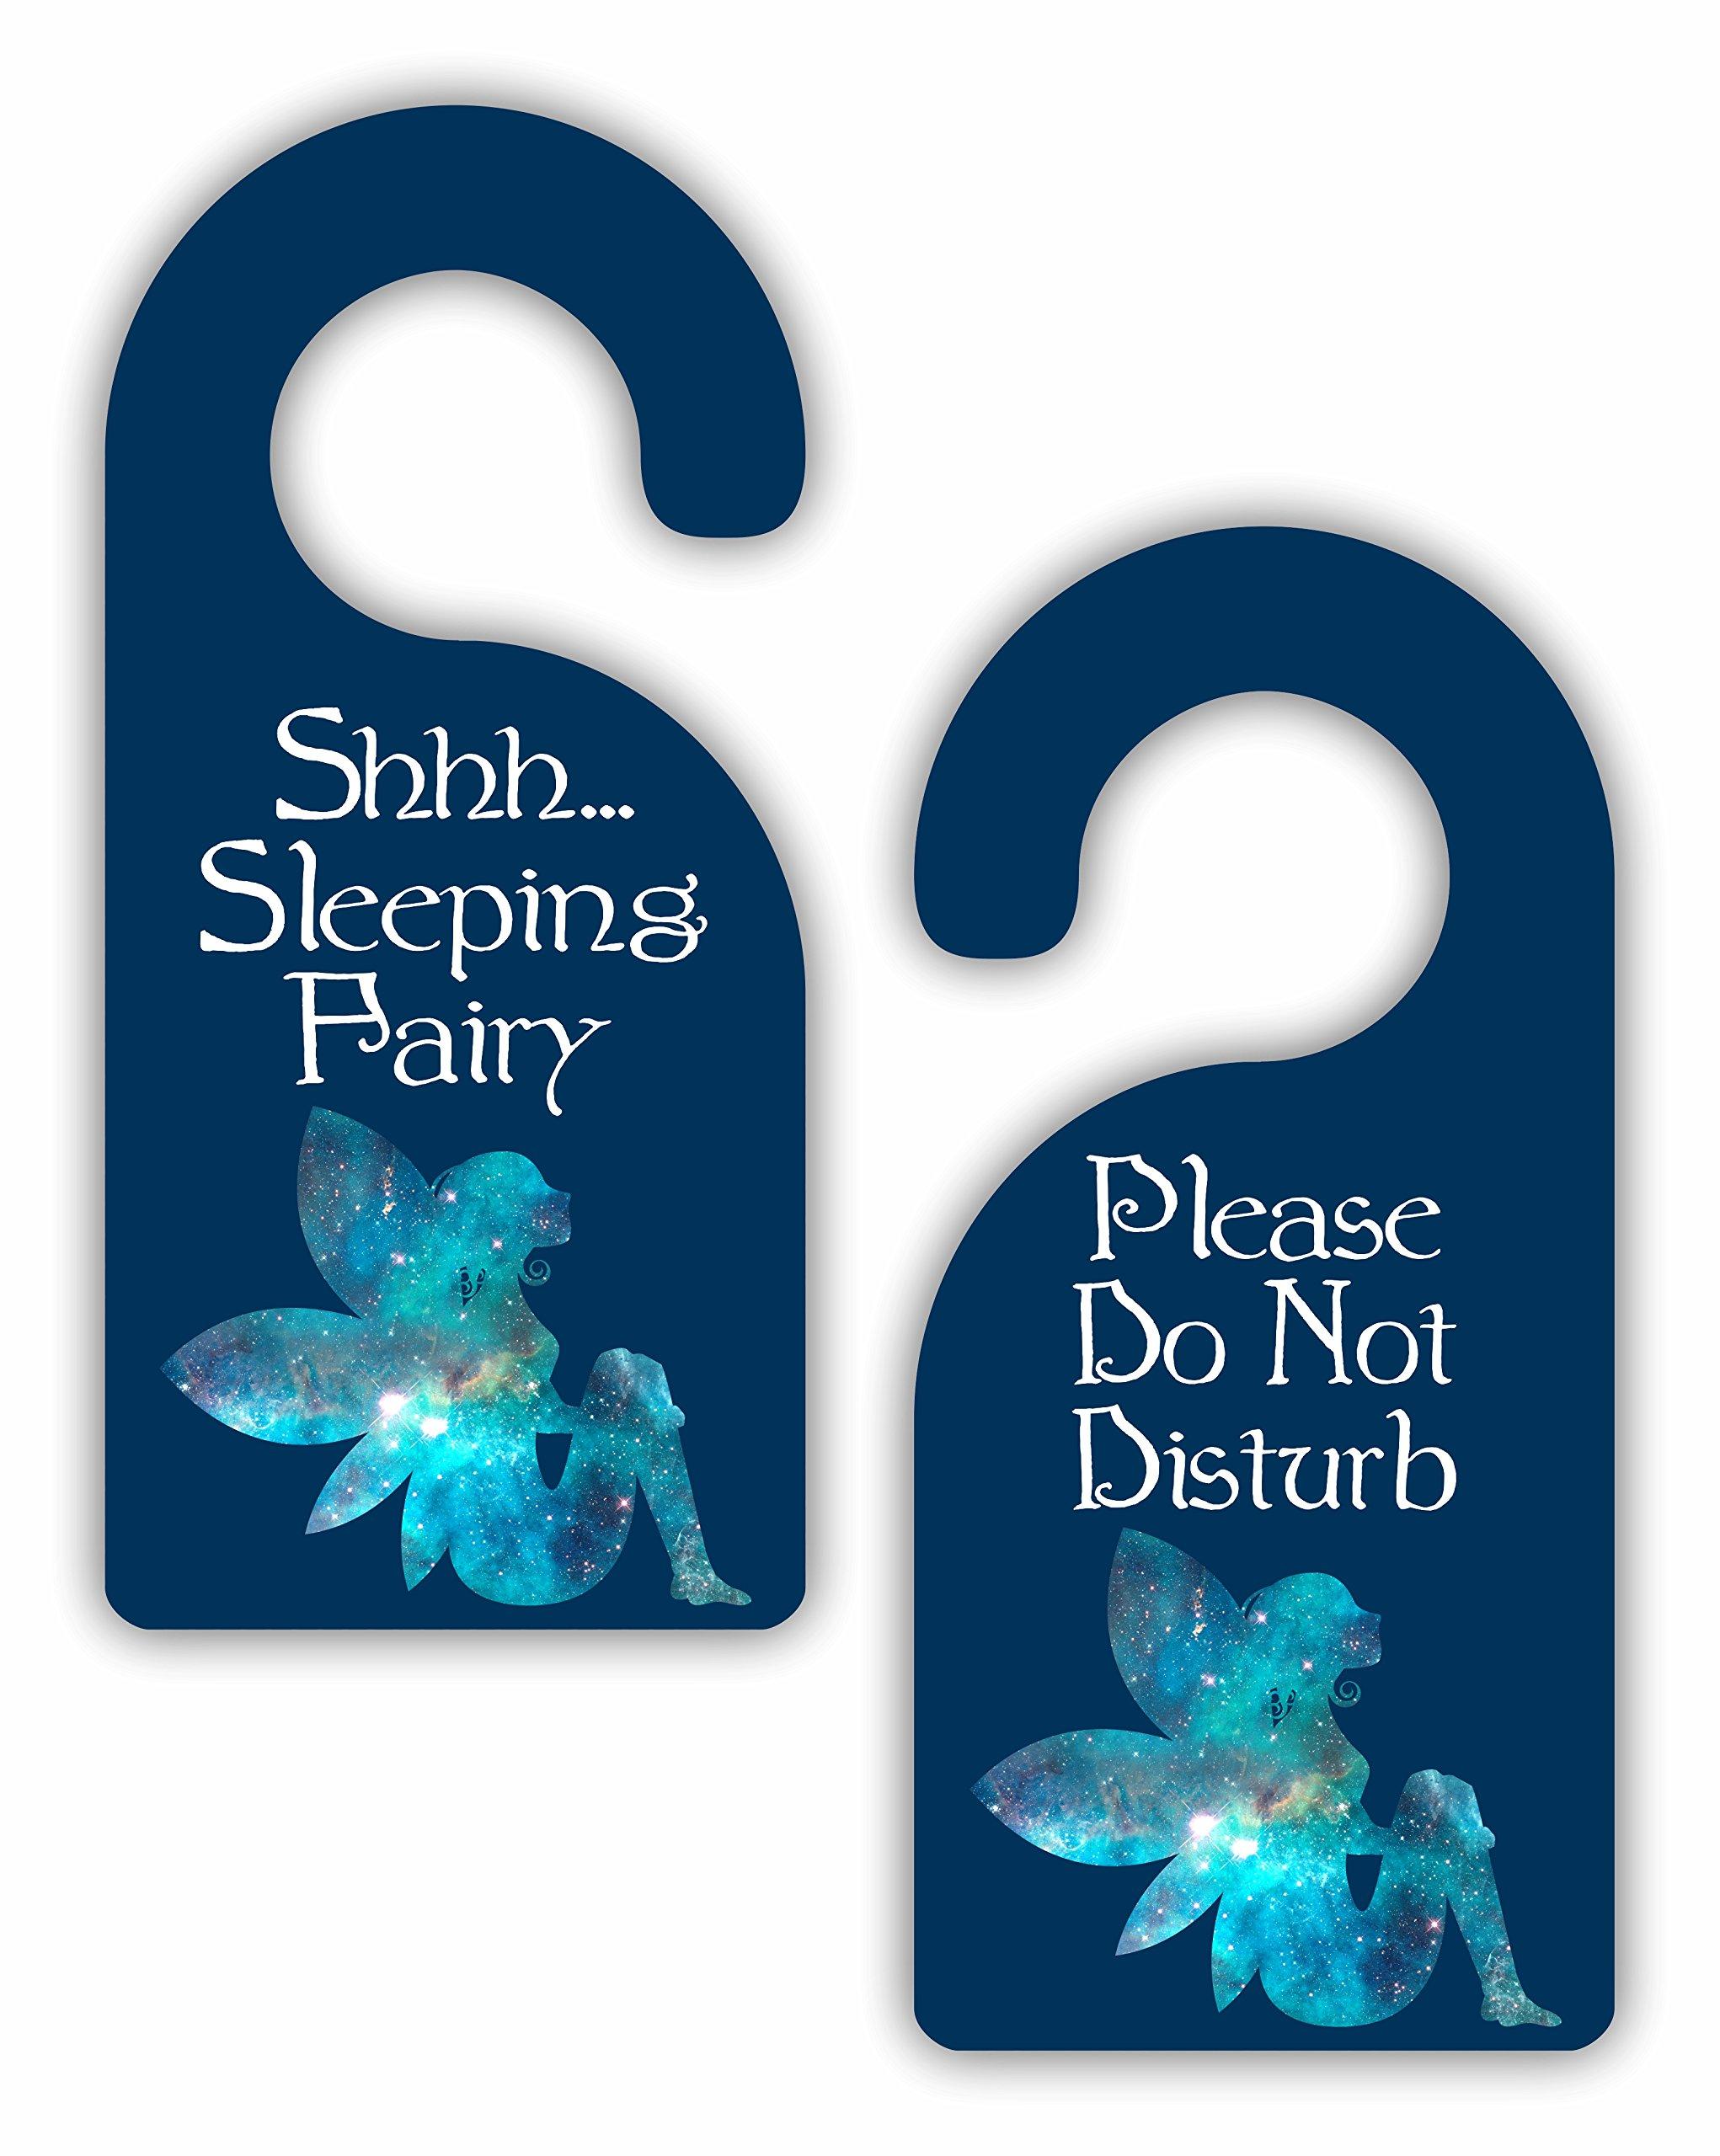 Sleeping Fairy - Novelty - Girls Room Door Sign Hanger - Double Sided - Hard Plastic - Glossy Finish